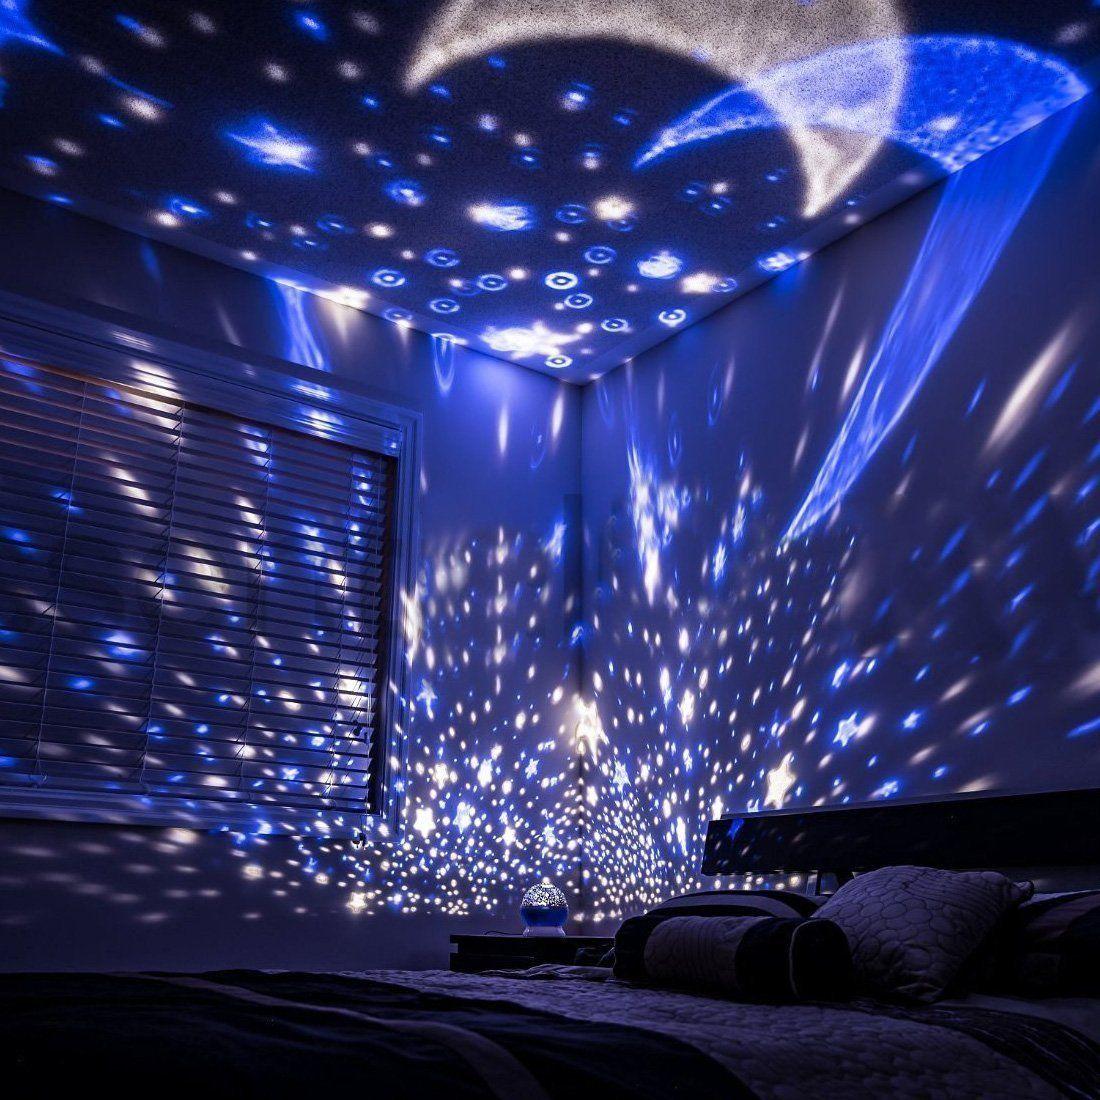 New Generation Baby Night Lights For Kids Lizber Starry